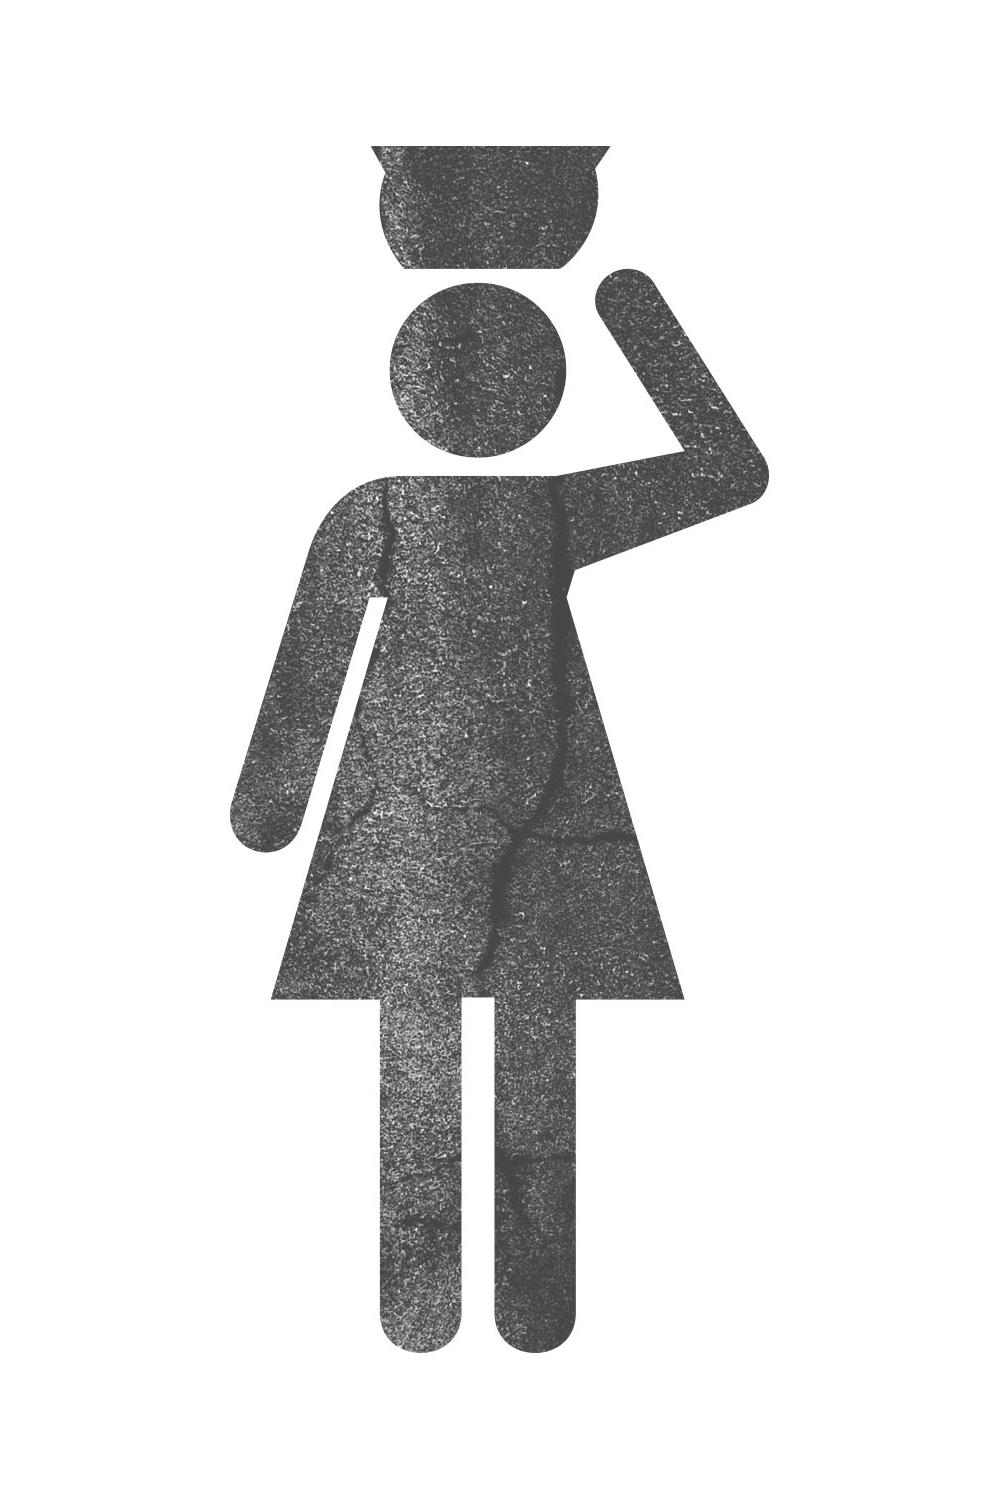 2017-10-TWB-Web-Icons-Textured-woman.jpg